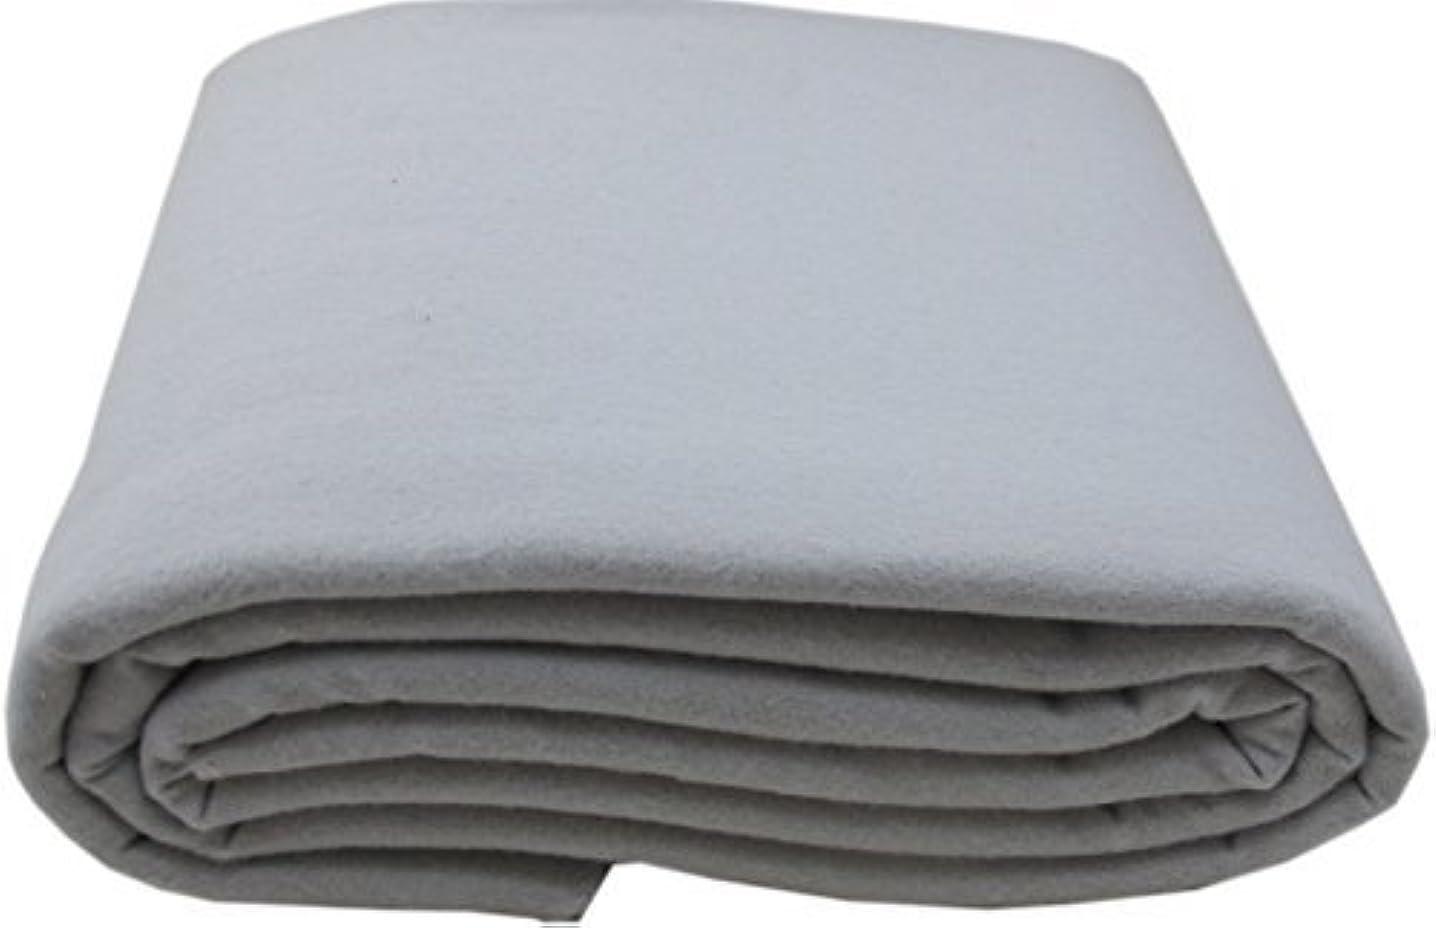 Anti-Tarnish Silver Cloth - Pre-cut by the Yard - Light Gray (2 Yards by 58